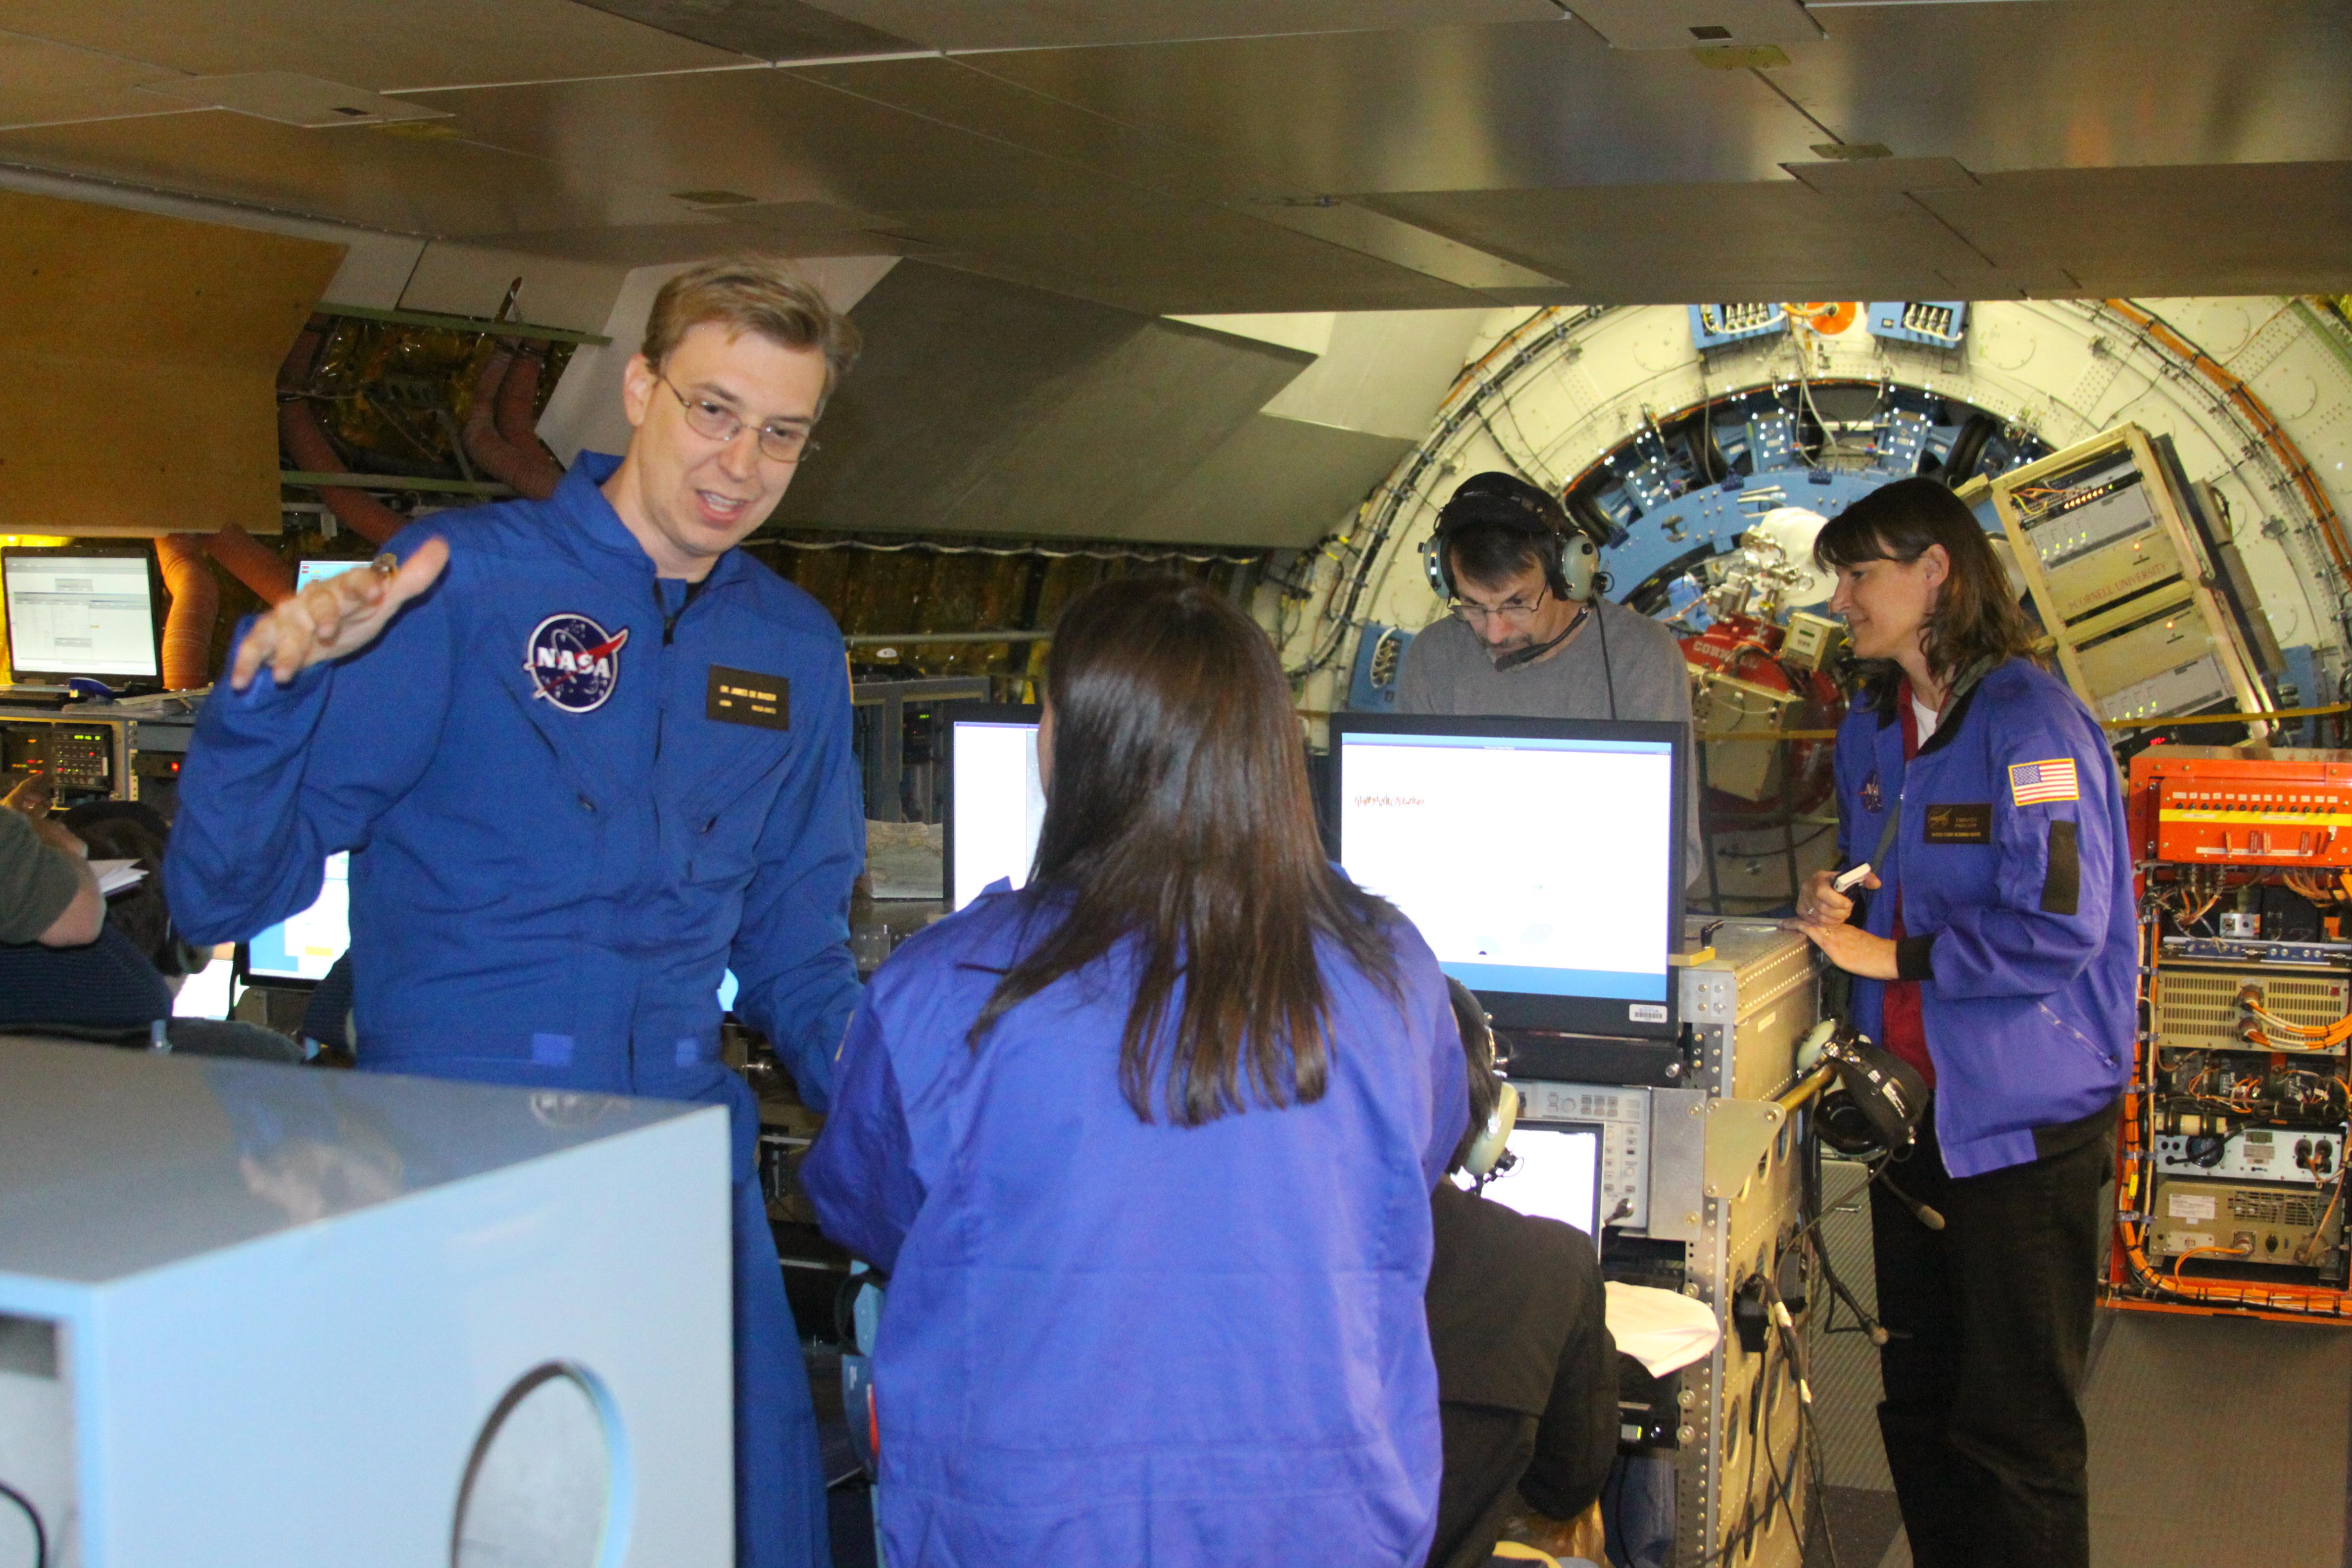 airborne astronomy ambassadors - Astronomy Jobs At Nasa